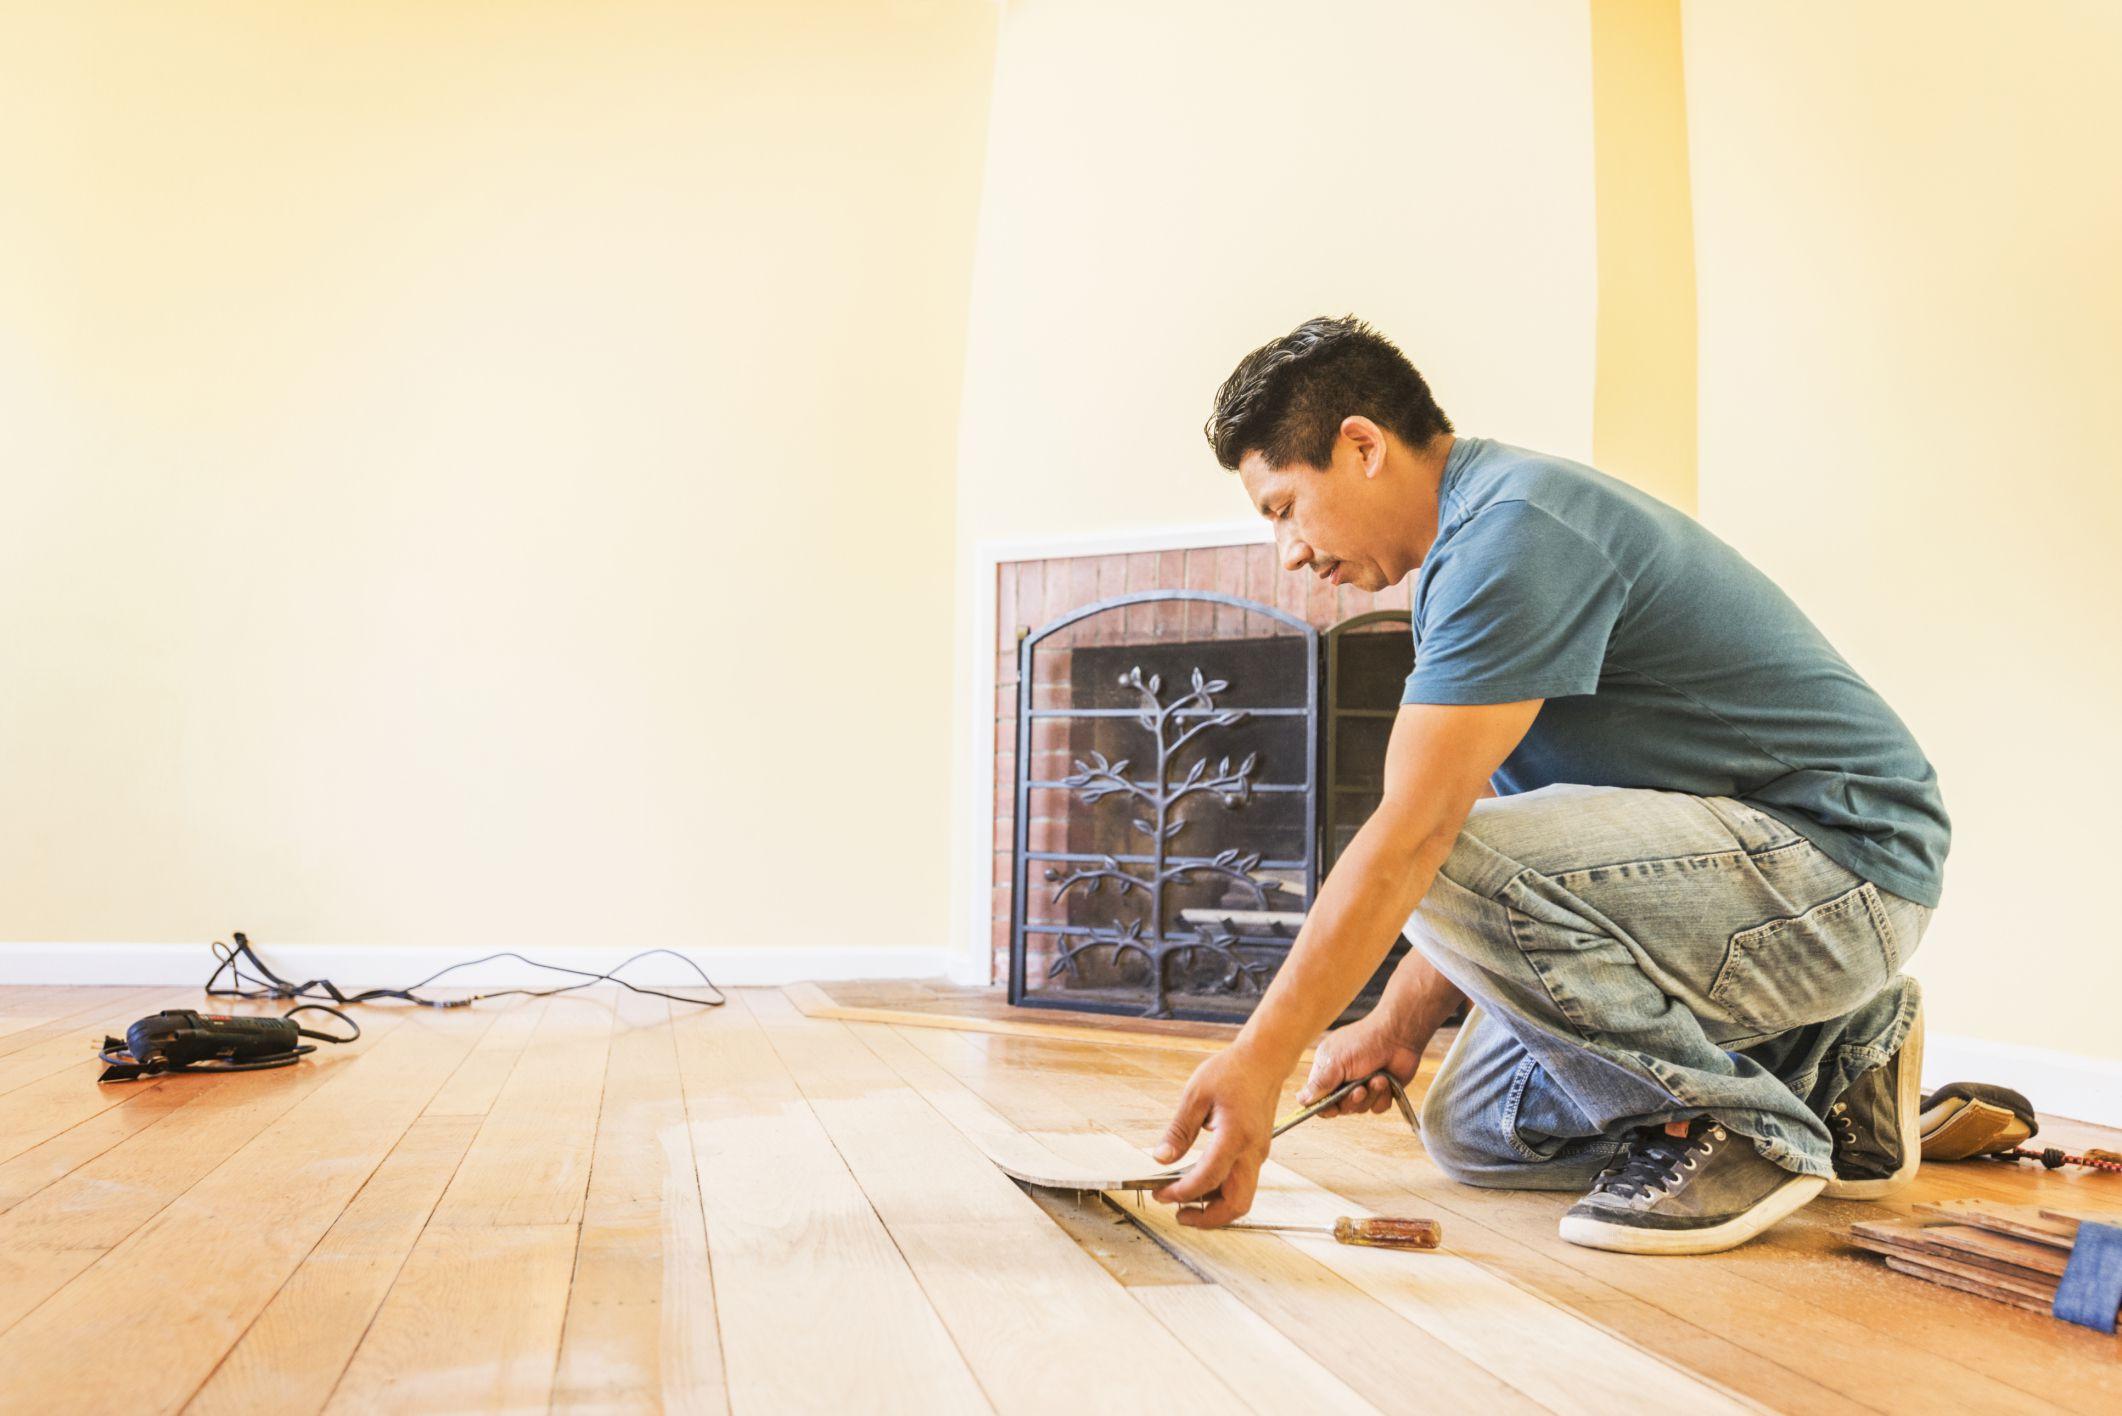 3 4 hardwood floor nailer of solid hardwood flooring costs for professional vs diy in installwoodflooring 592016327 56684d6f3df78ce1610a598a